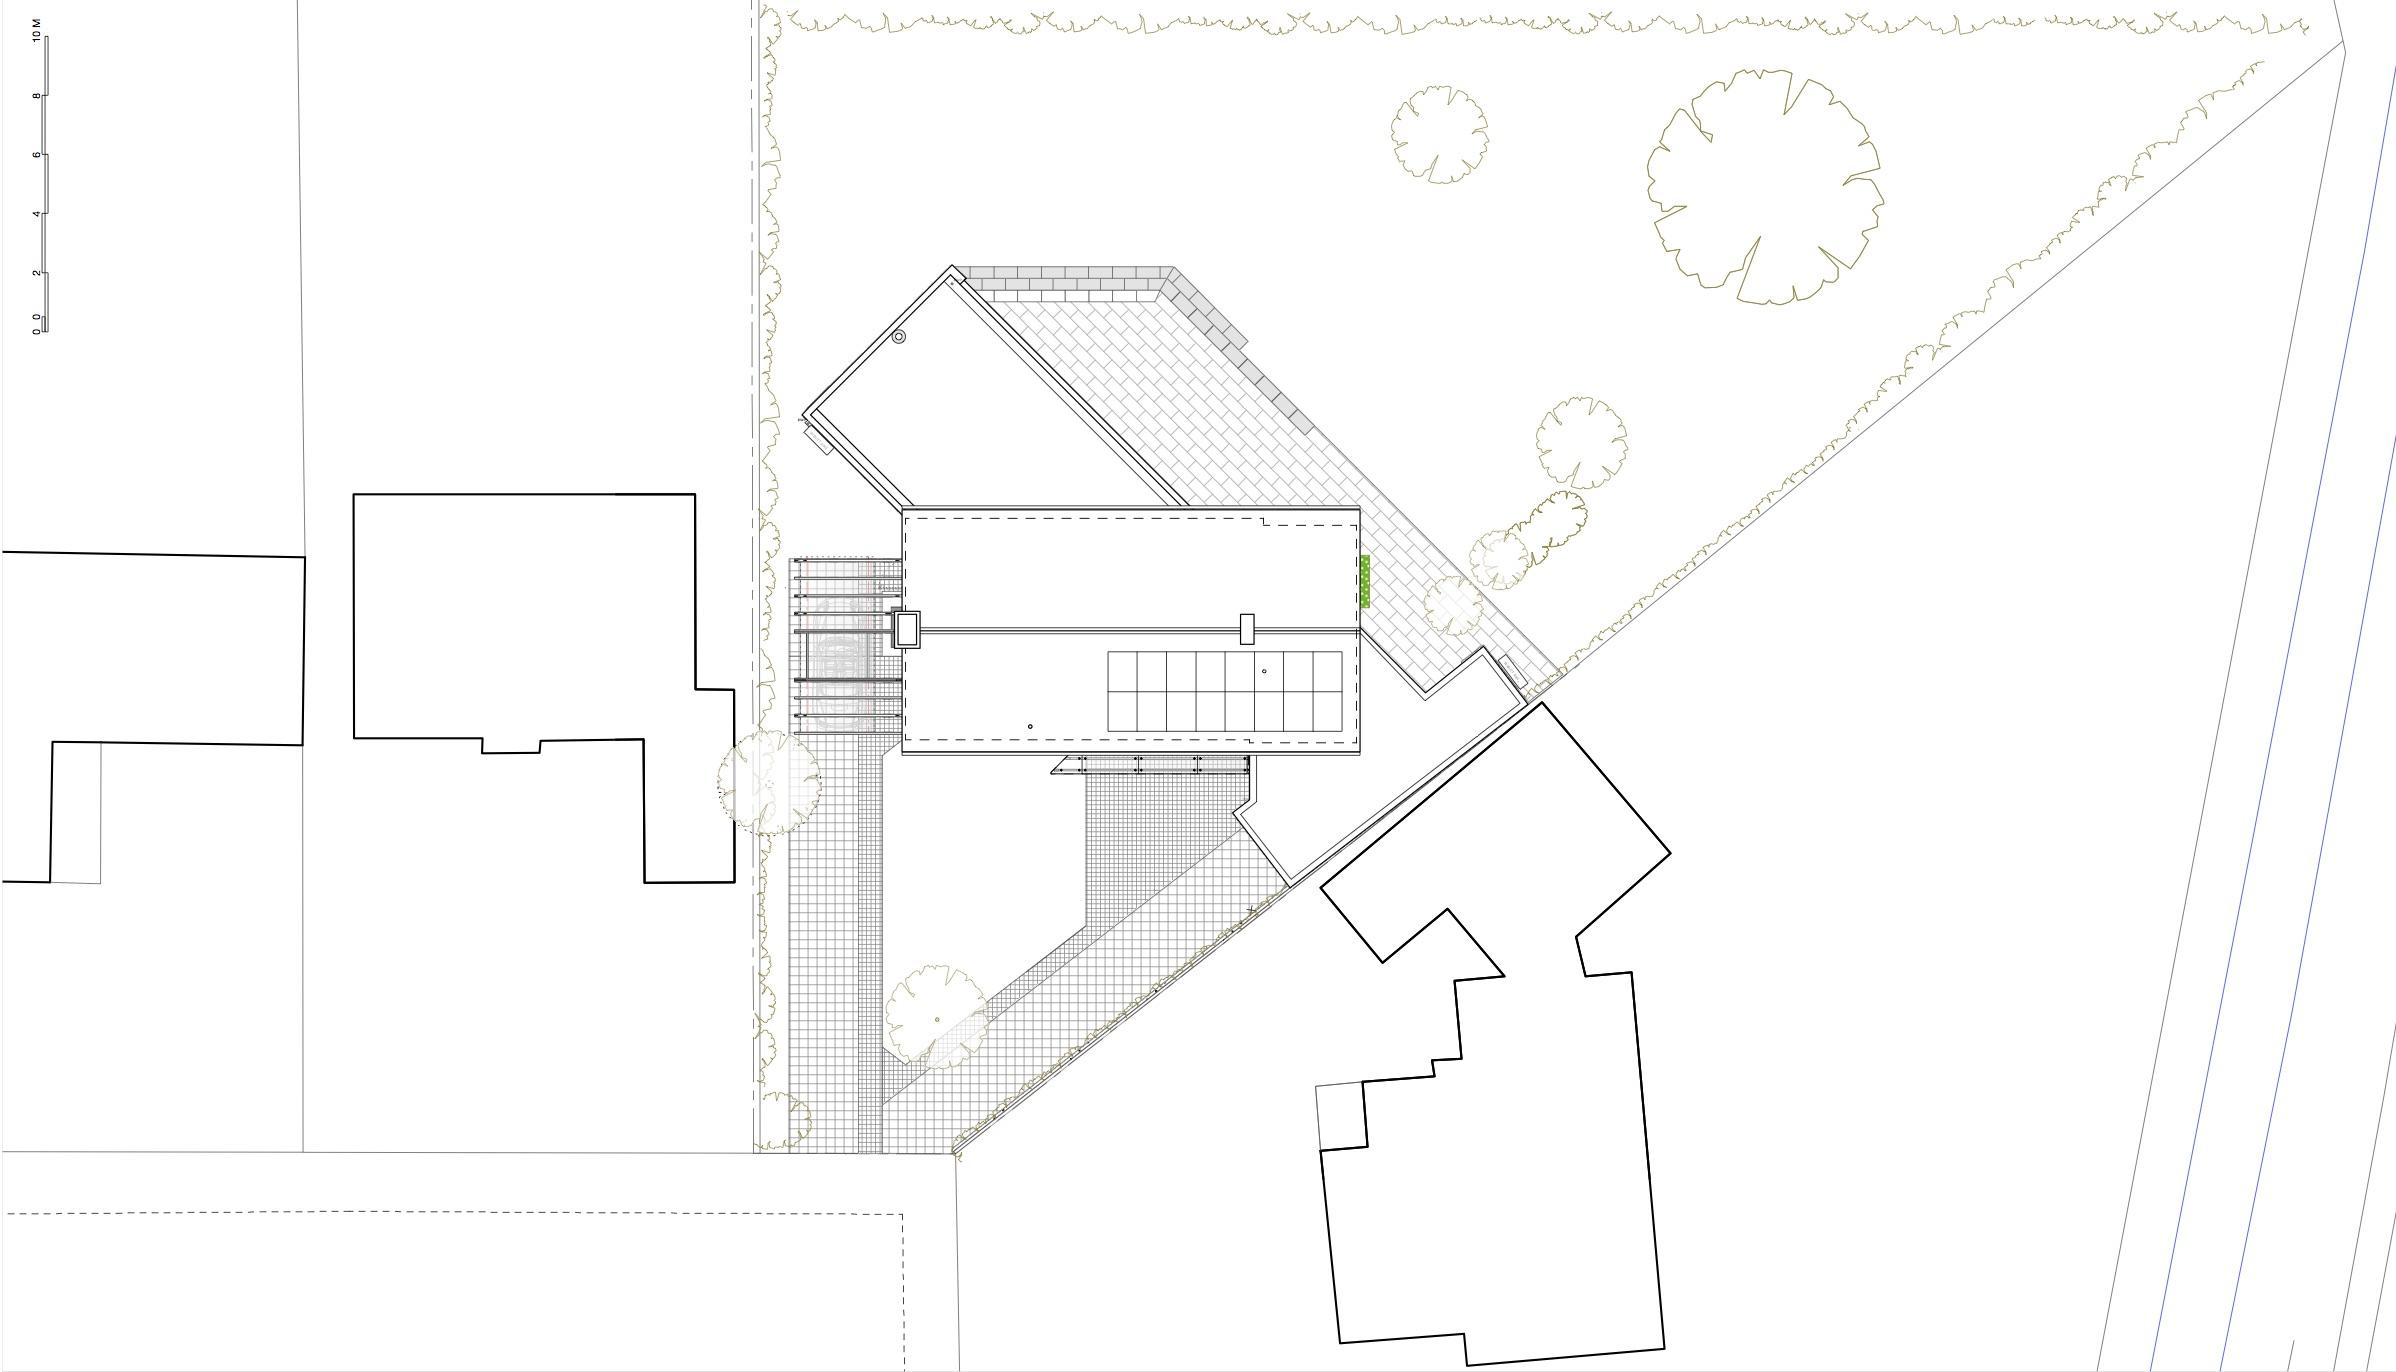 Architect, Cambridge, Home design, house, renovation, geometry, porsche, solar, large sliding doors, level threshold, blurring inside outside, garden, big door opening,